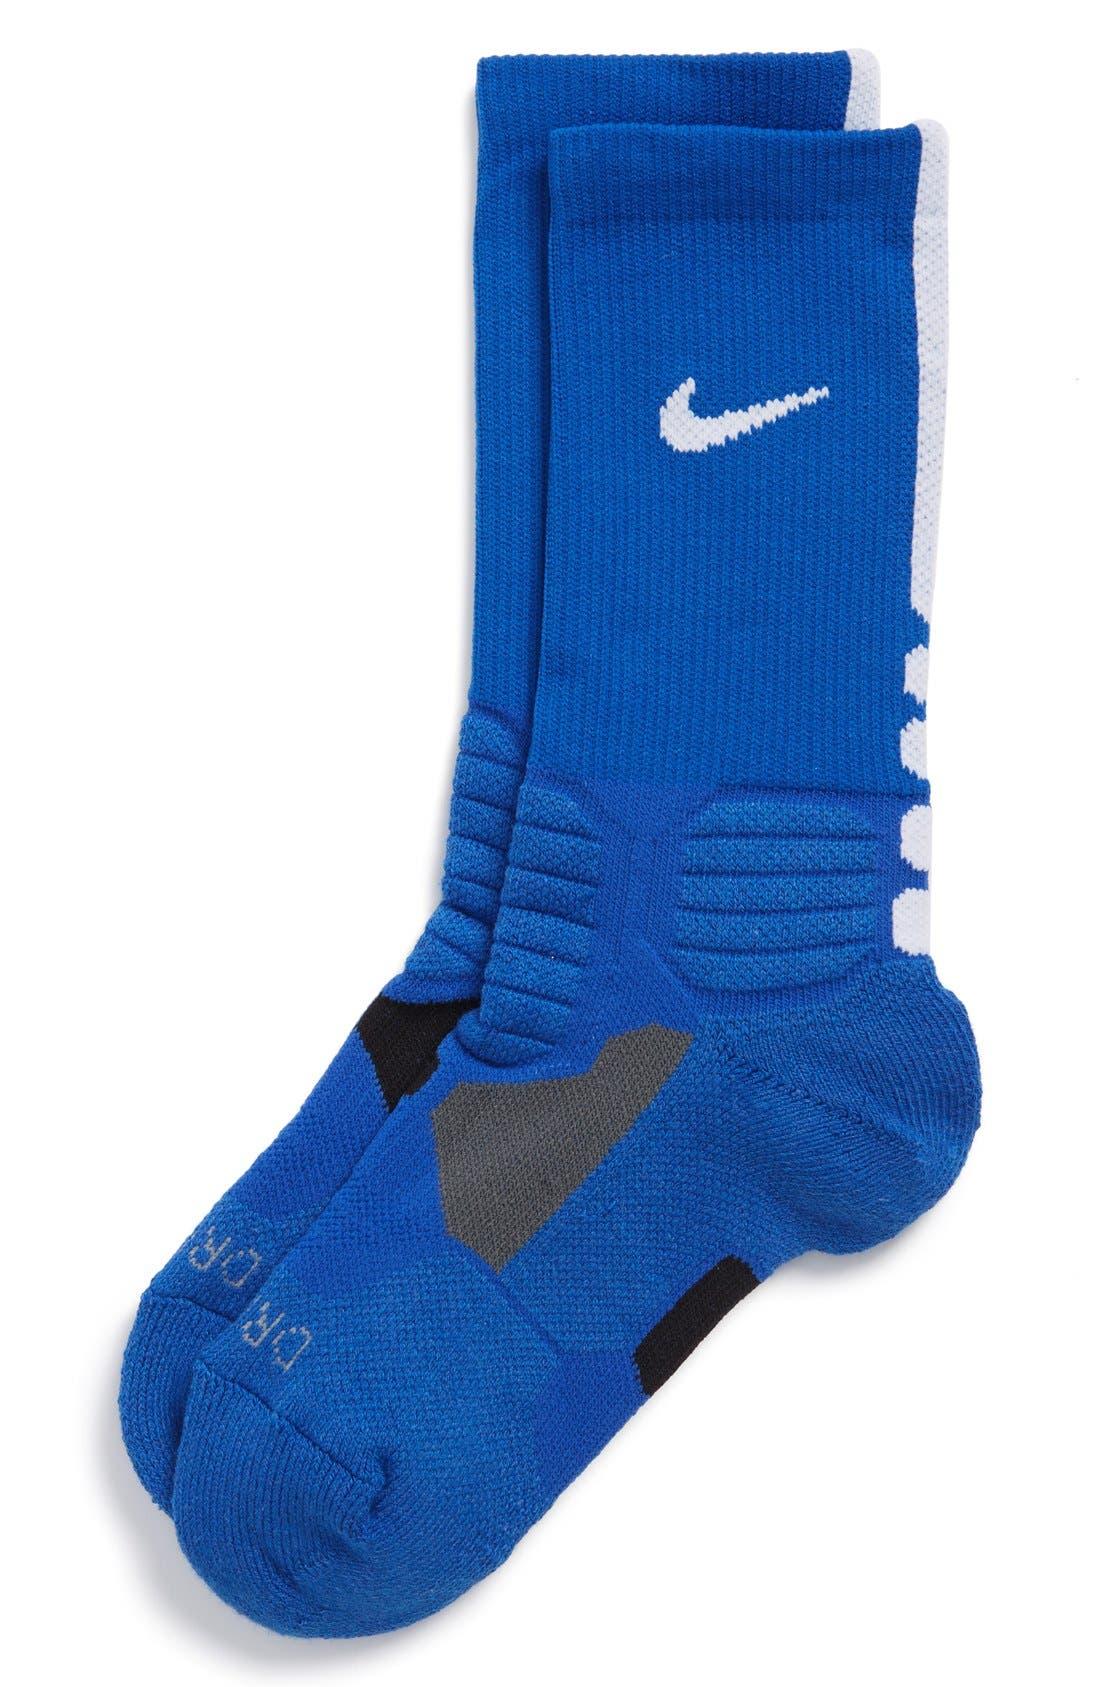 Main Image - Nike 'Hyper Elite' Dri-FIT Basketball Socks (Big Kid)